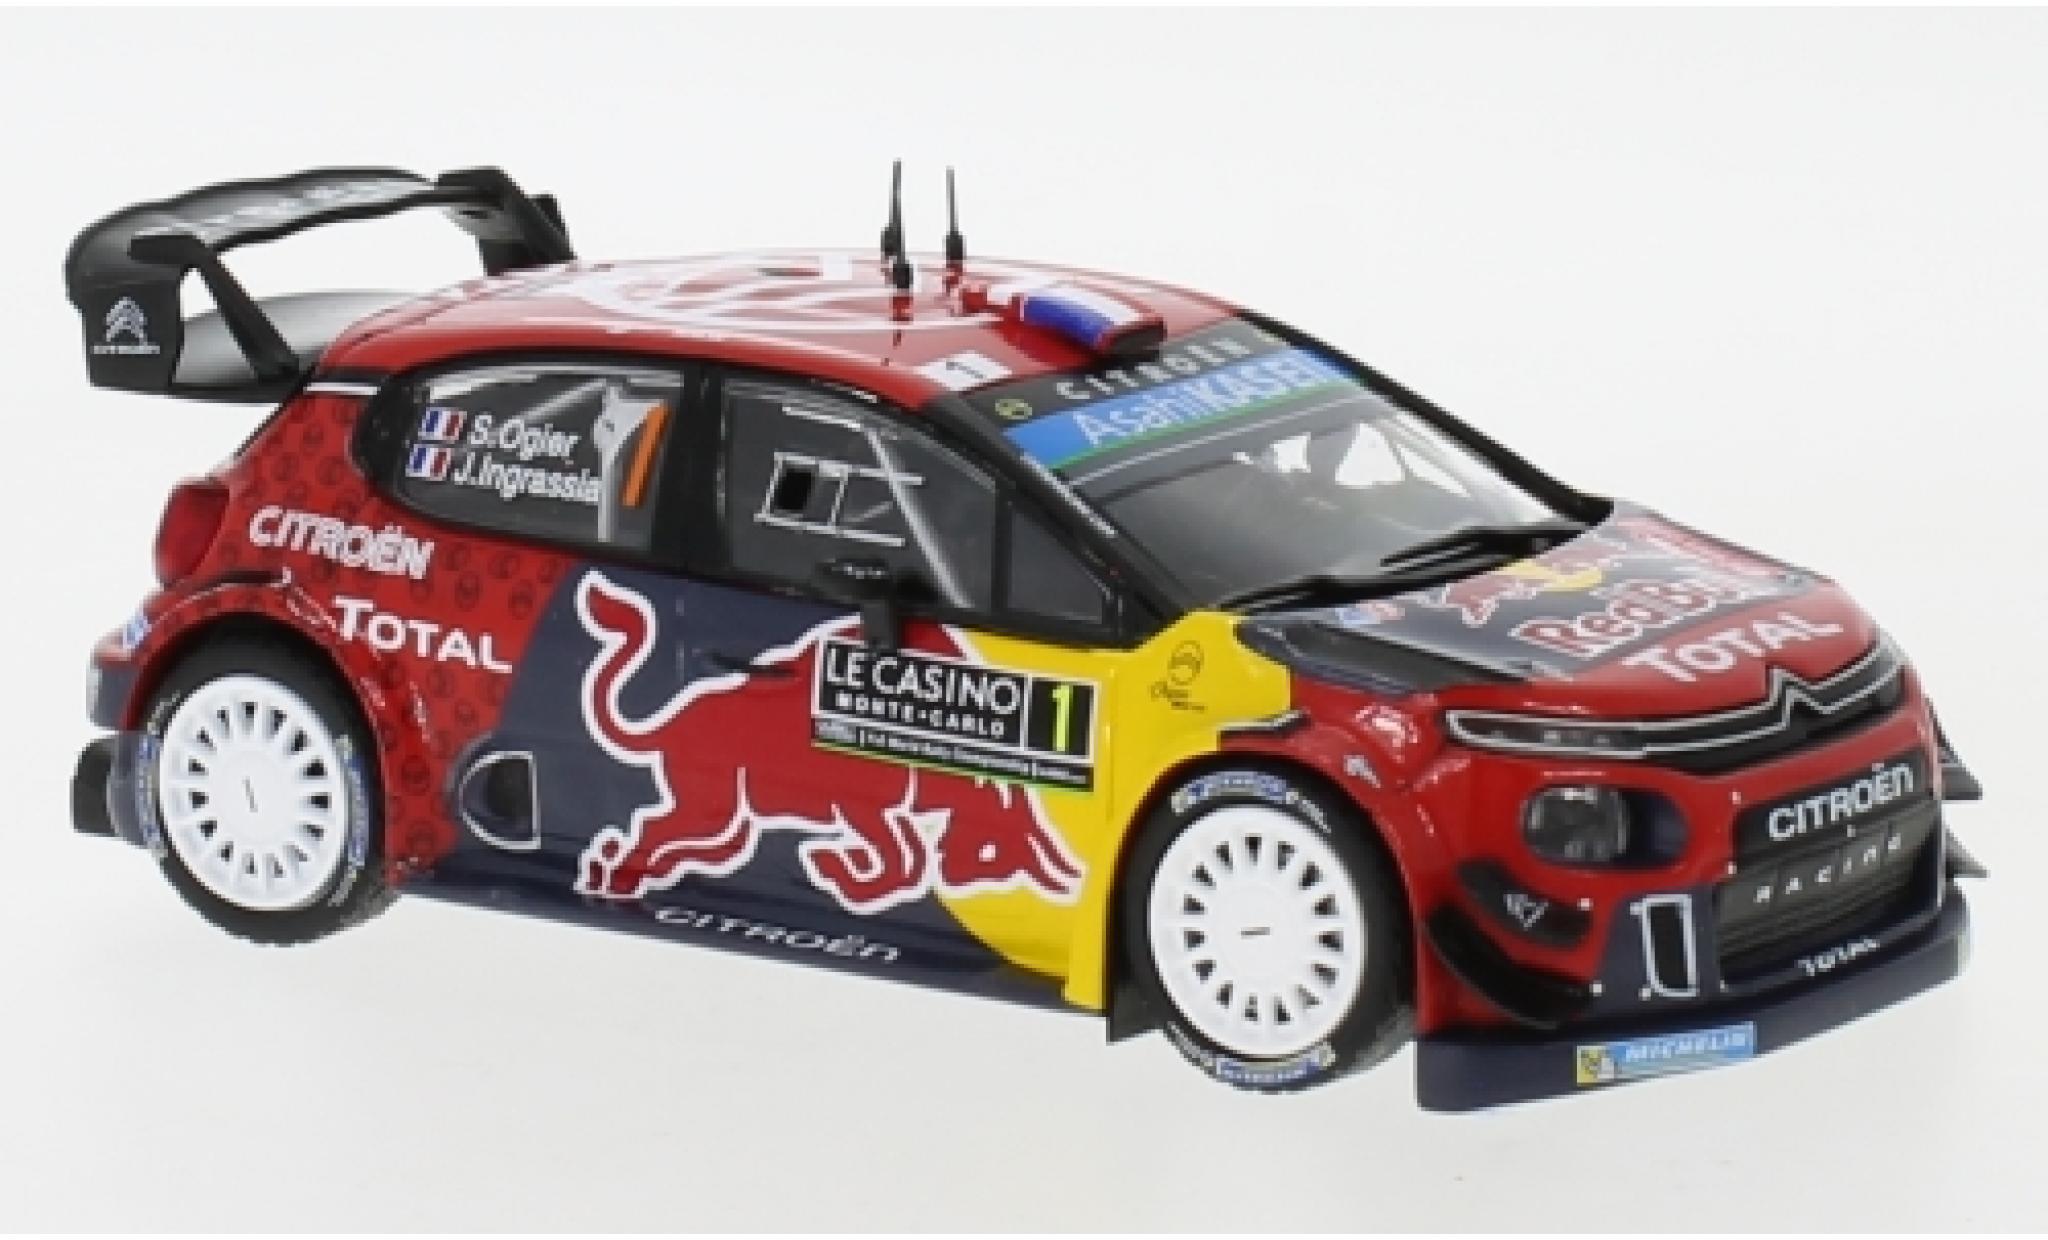 Citroen C3 1/43 IXO WRC No.1 Red Bull WRC Rallye Monte Carlo 2019 S.Ogier/J.Ingrassia